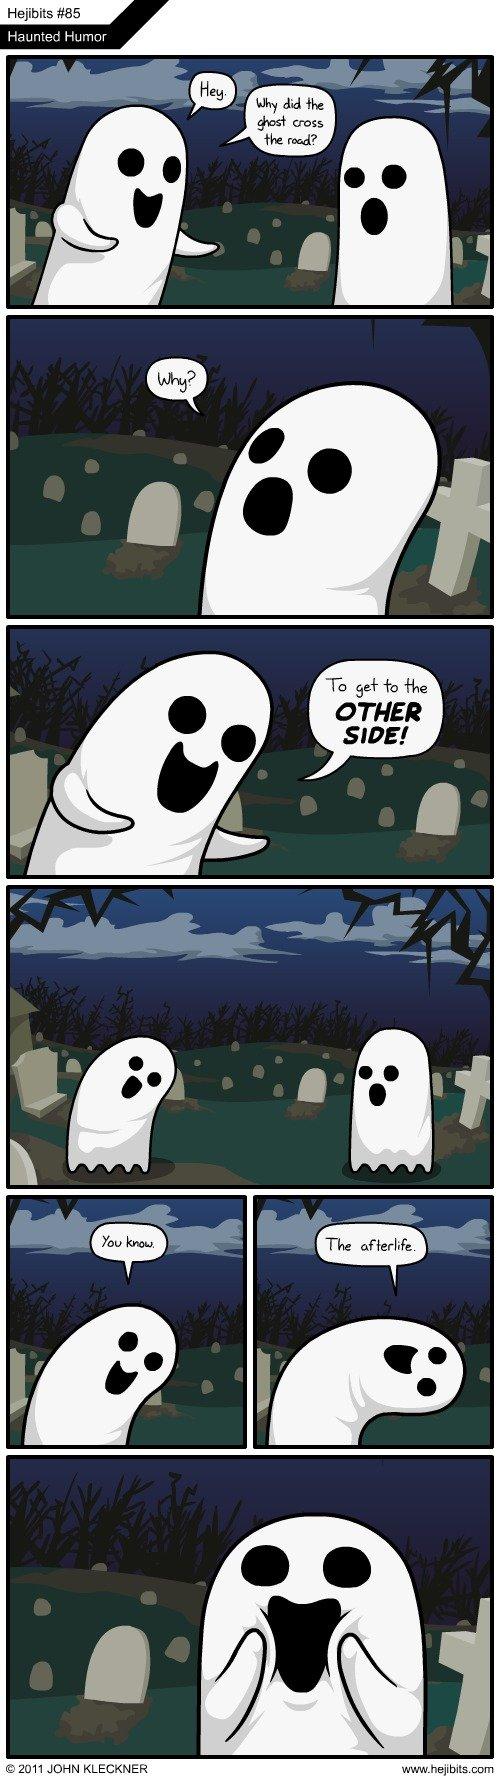 Haunted Humor. Top 3! Uhuhuhuhuhuh Creds to Hejibits. Haunted Humor NI 2011 MCEIHT lea% Th, EH. This is bound to be useful someday. so fucking punny omg ahahahahahahaha ghosts fuck yeah